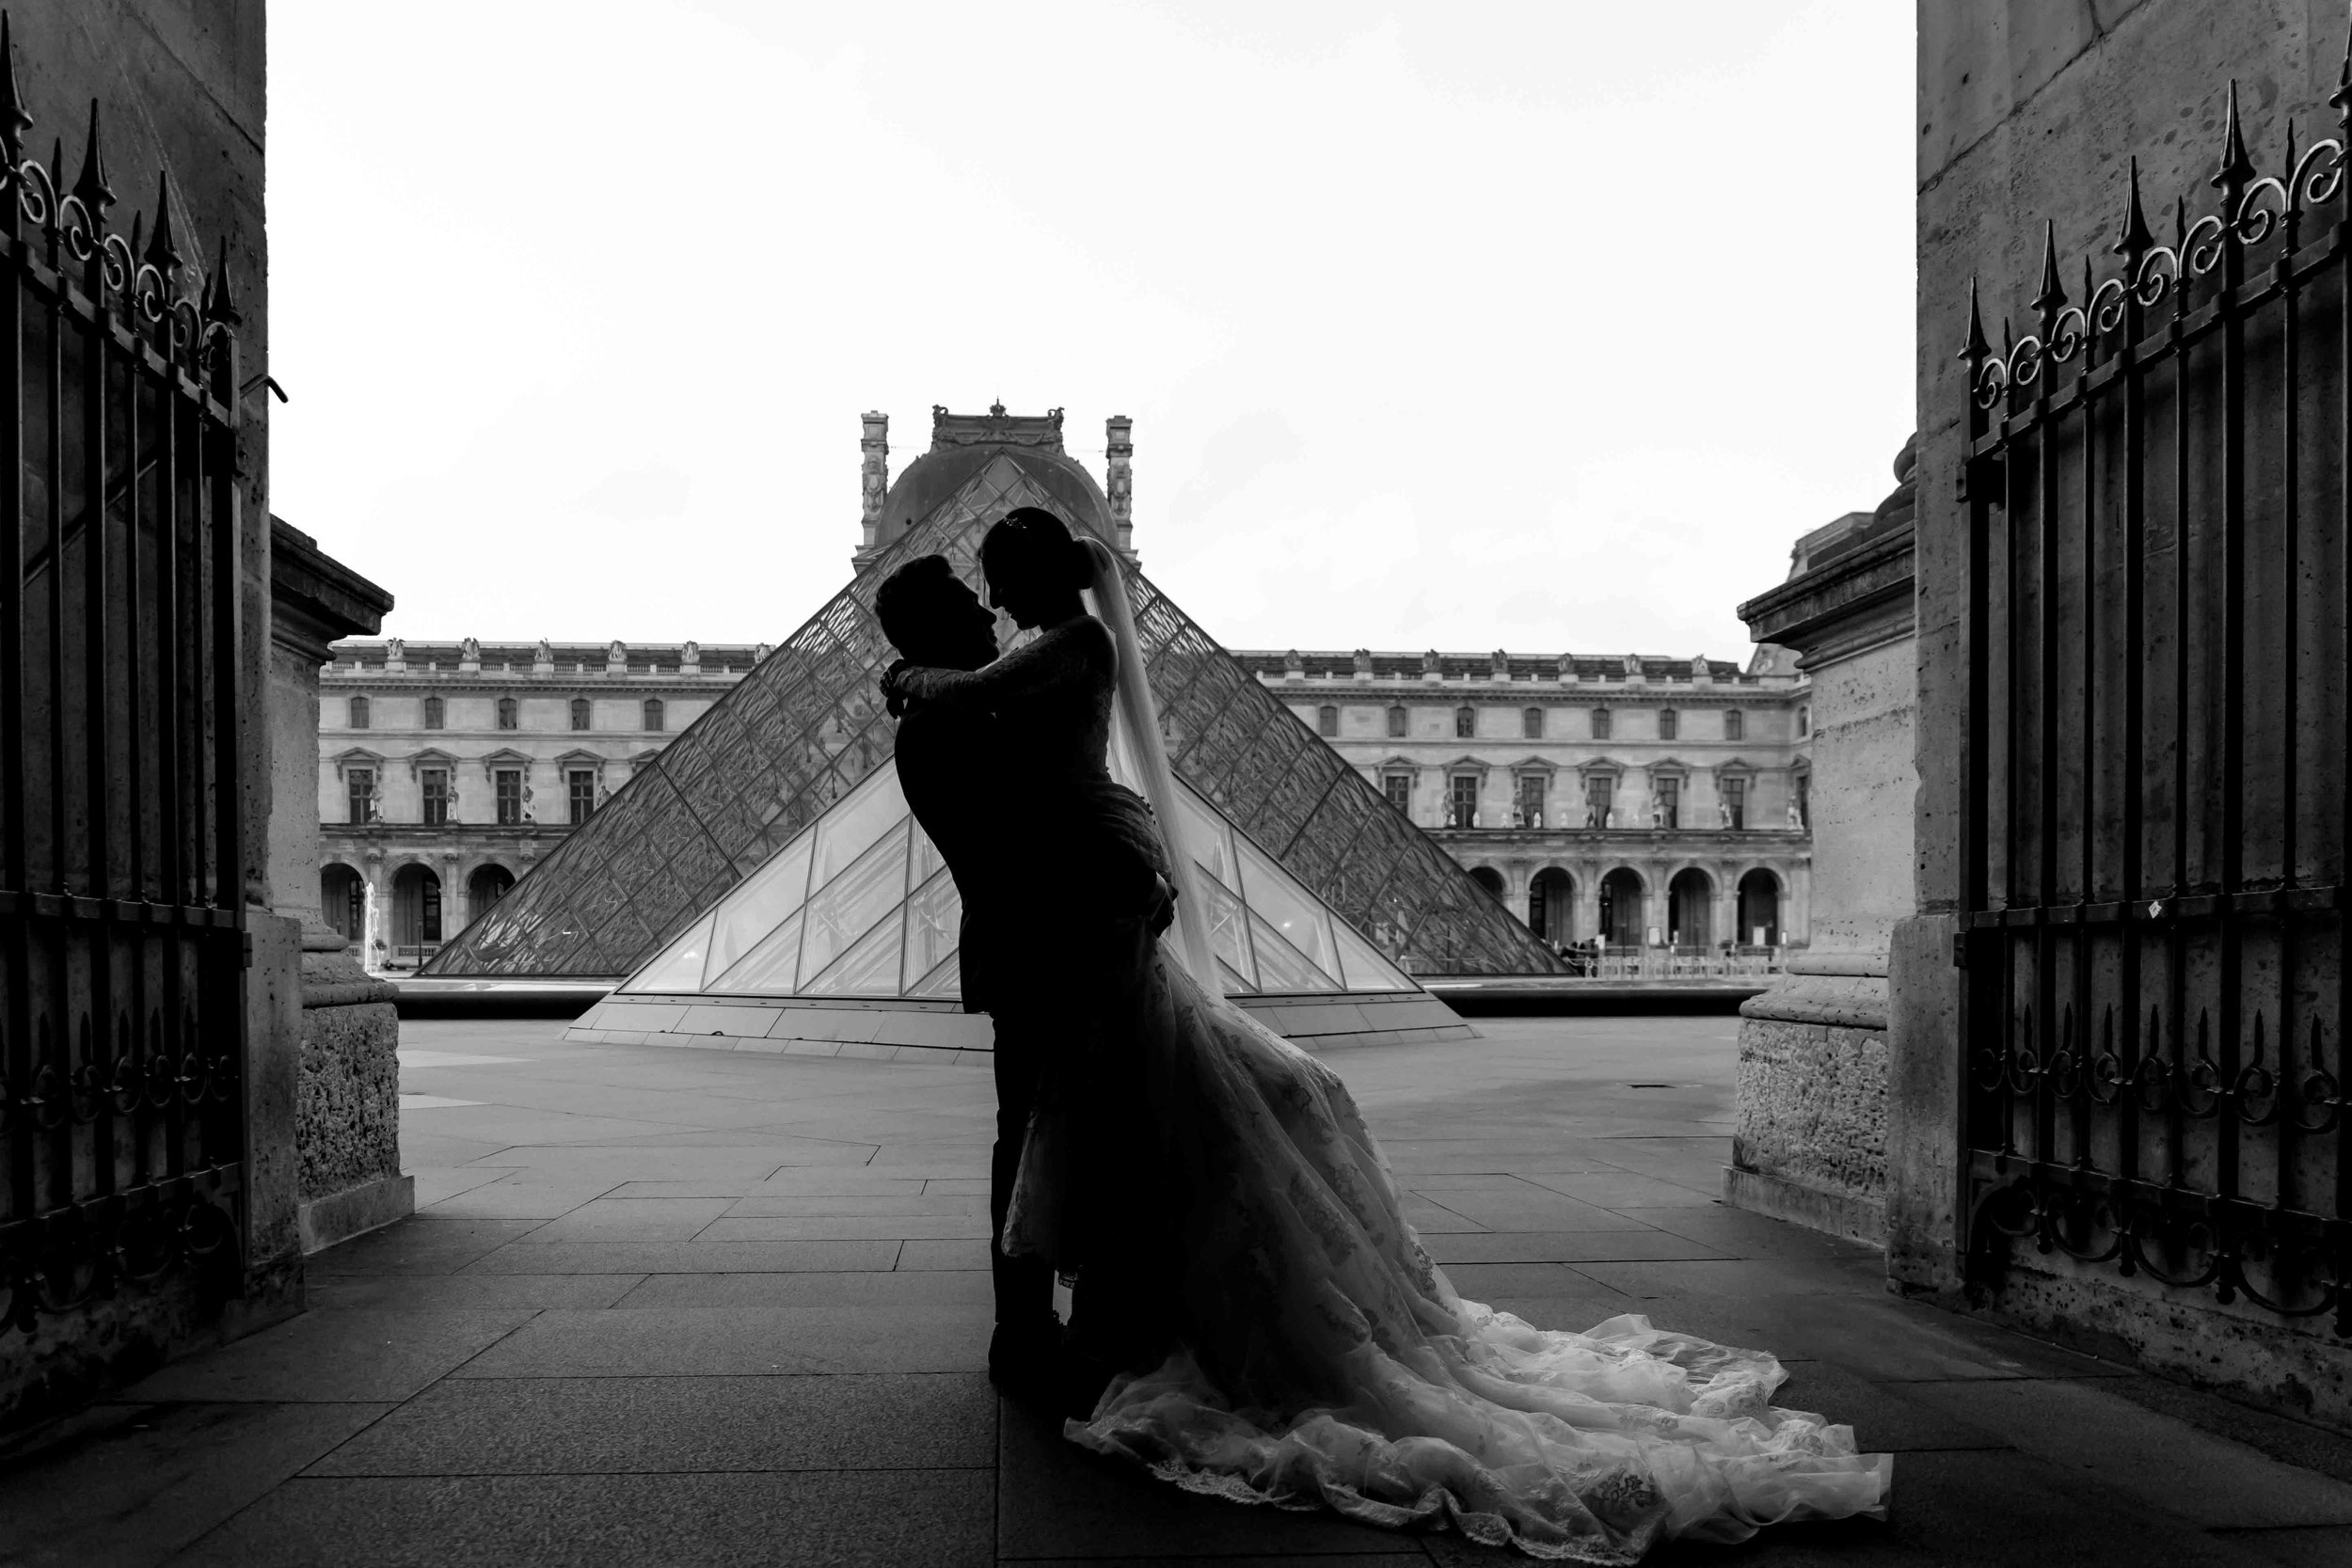 Balades_Photographiques_Paris_Merve_Kemel-19bis.jpg